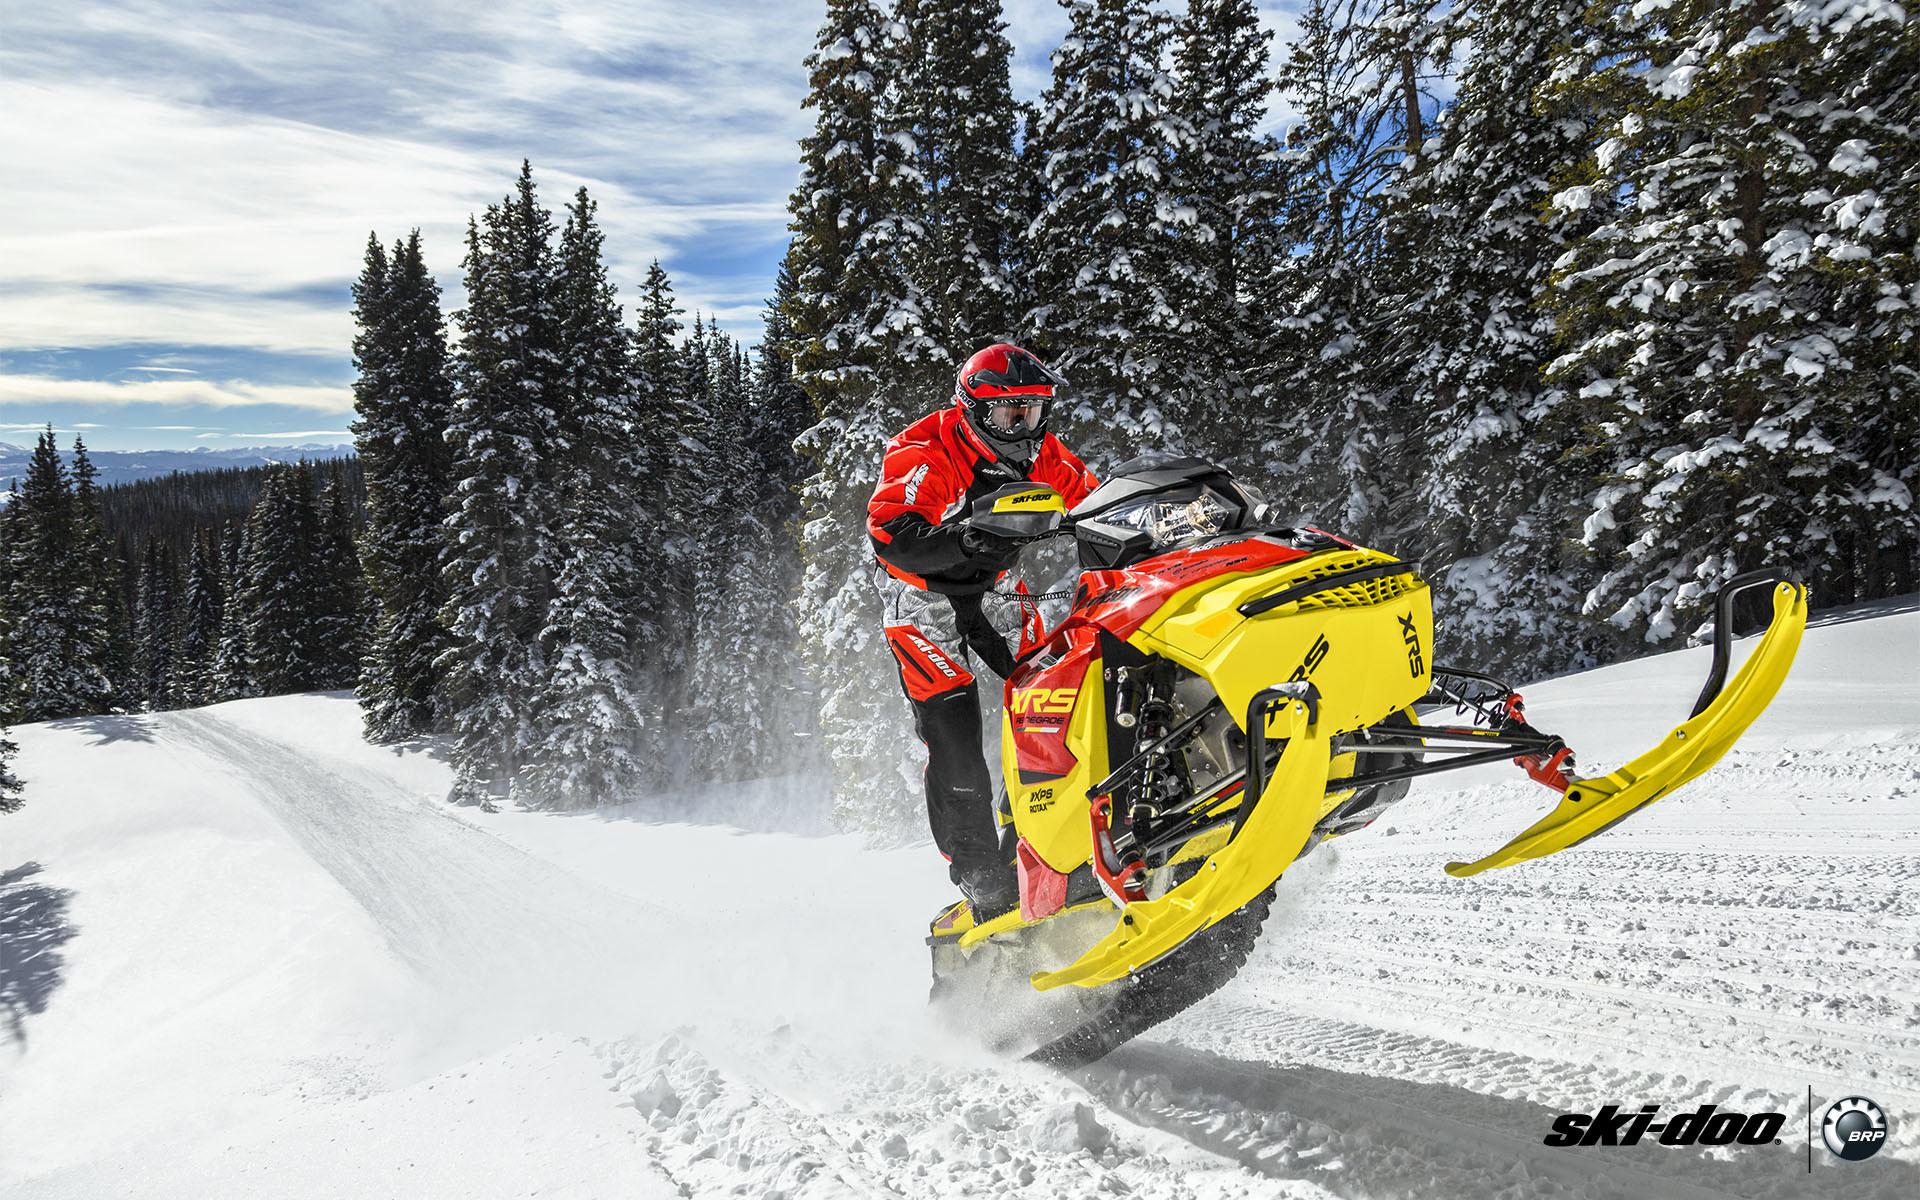 Ski Doo Wallpaper  60  Images